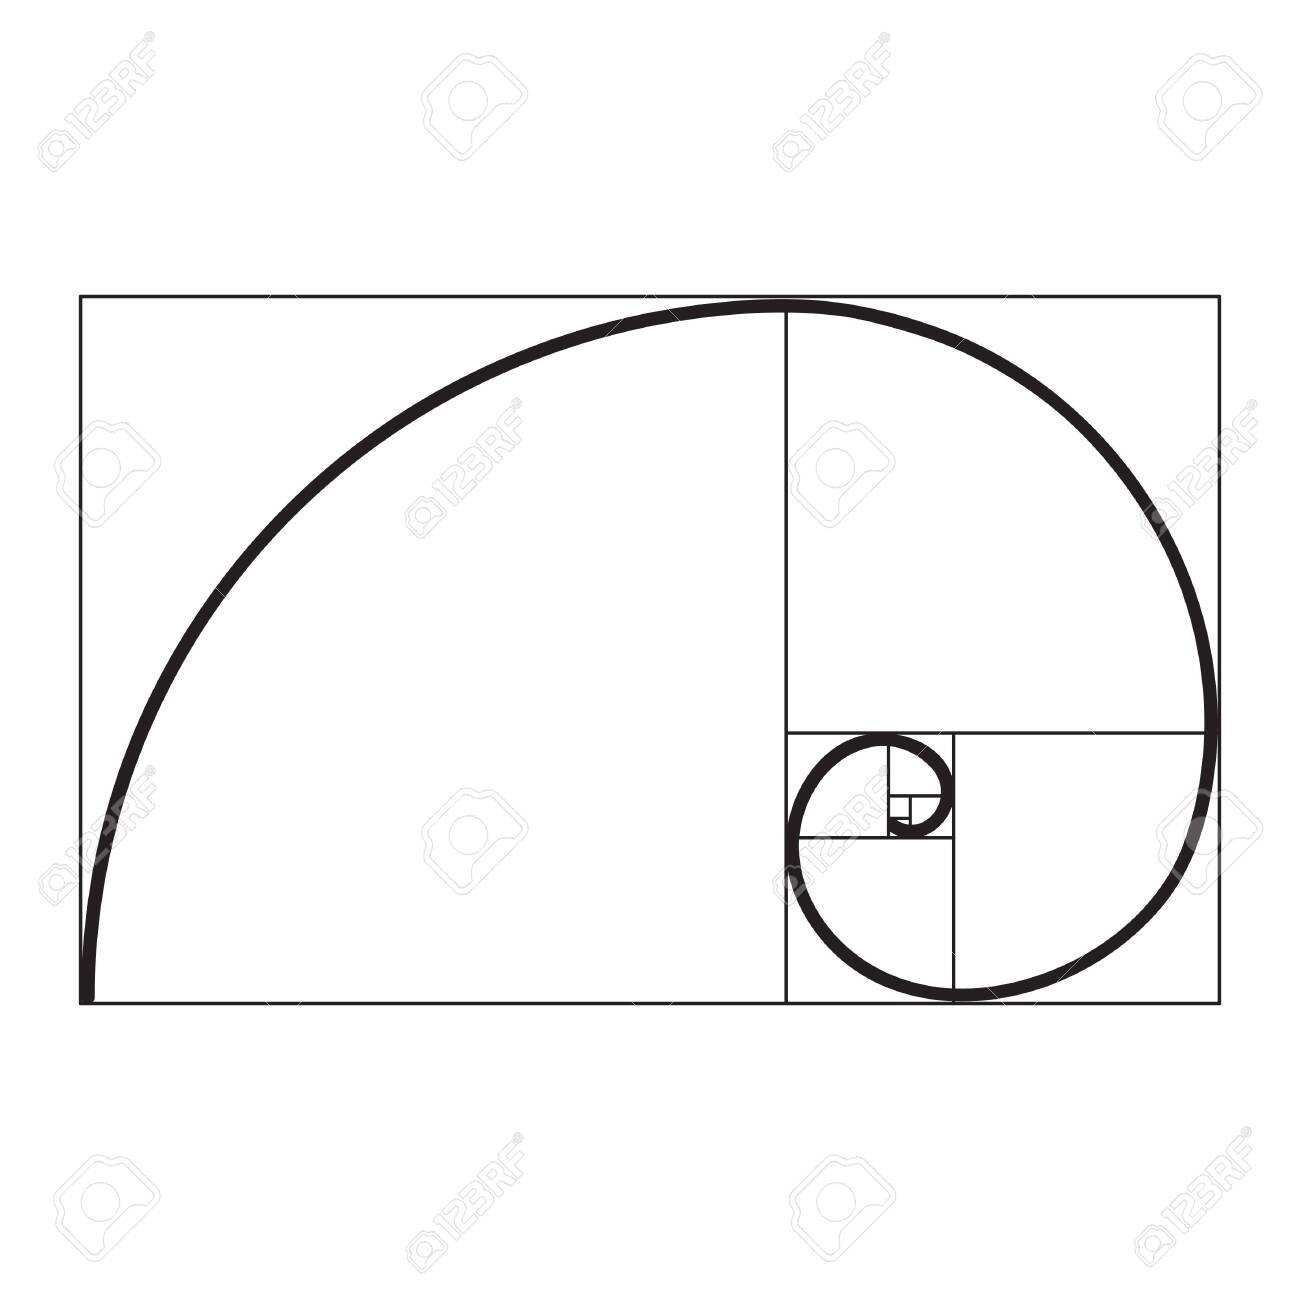 golden ratio spiral - 133387179